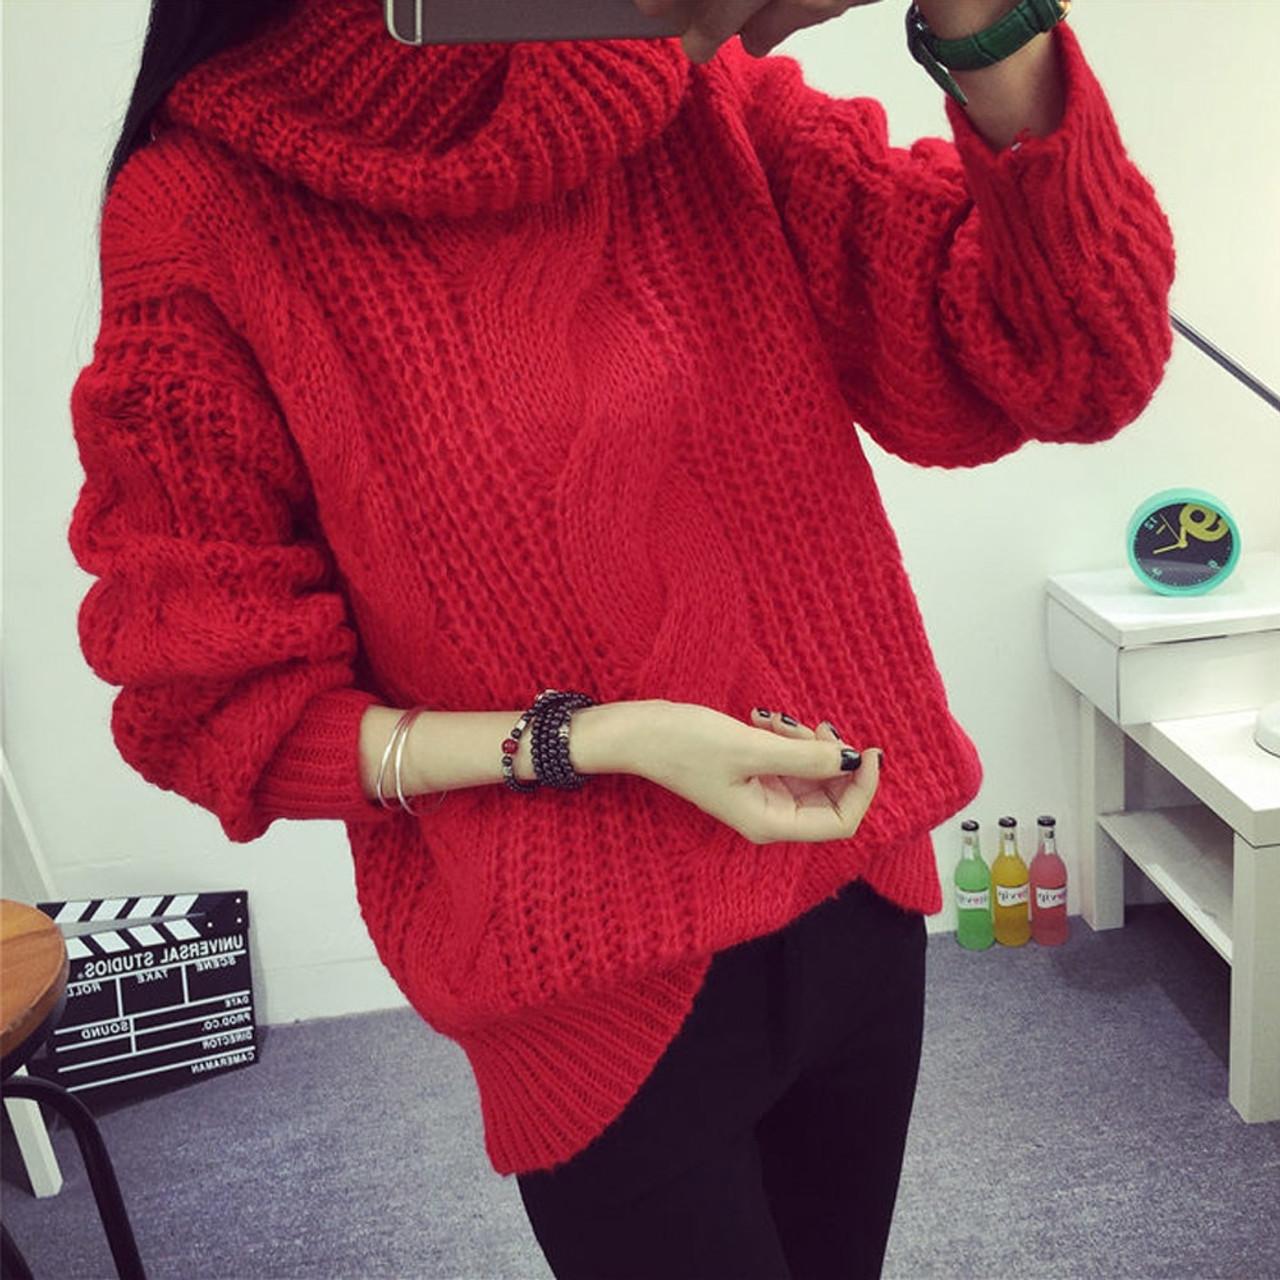 6edbf89dd957 In stock Women Winter Sweaters and Pullovers Turtleneck Sweater ...